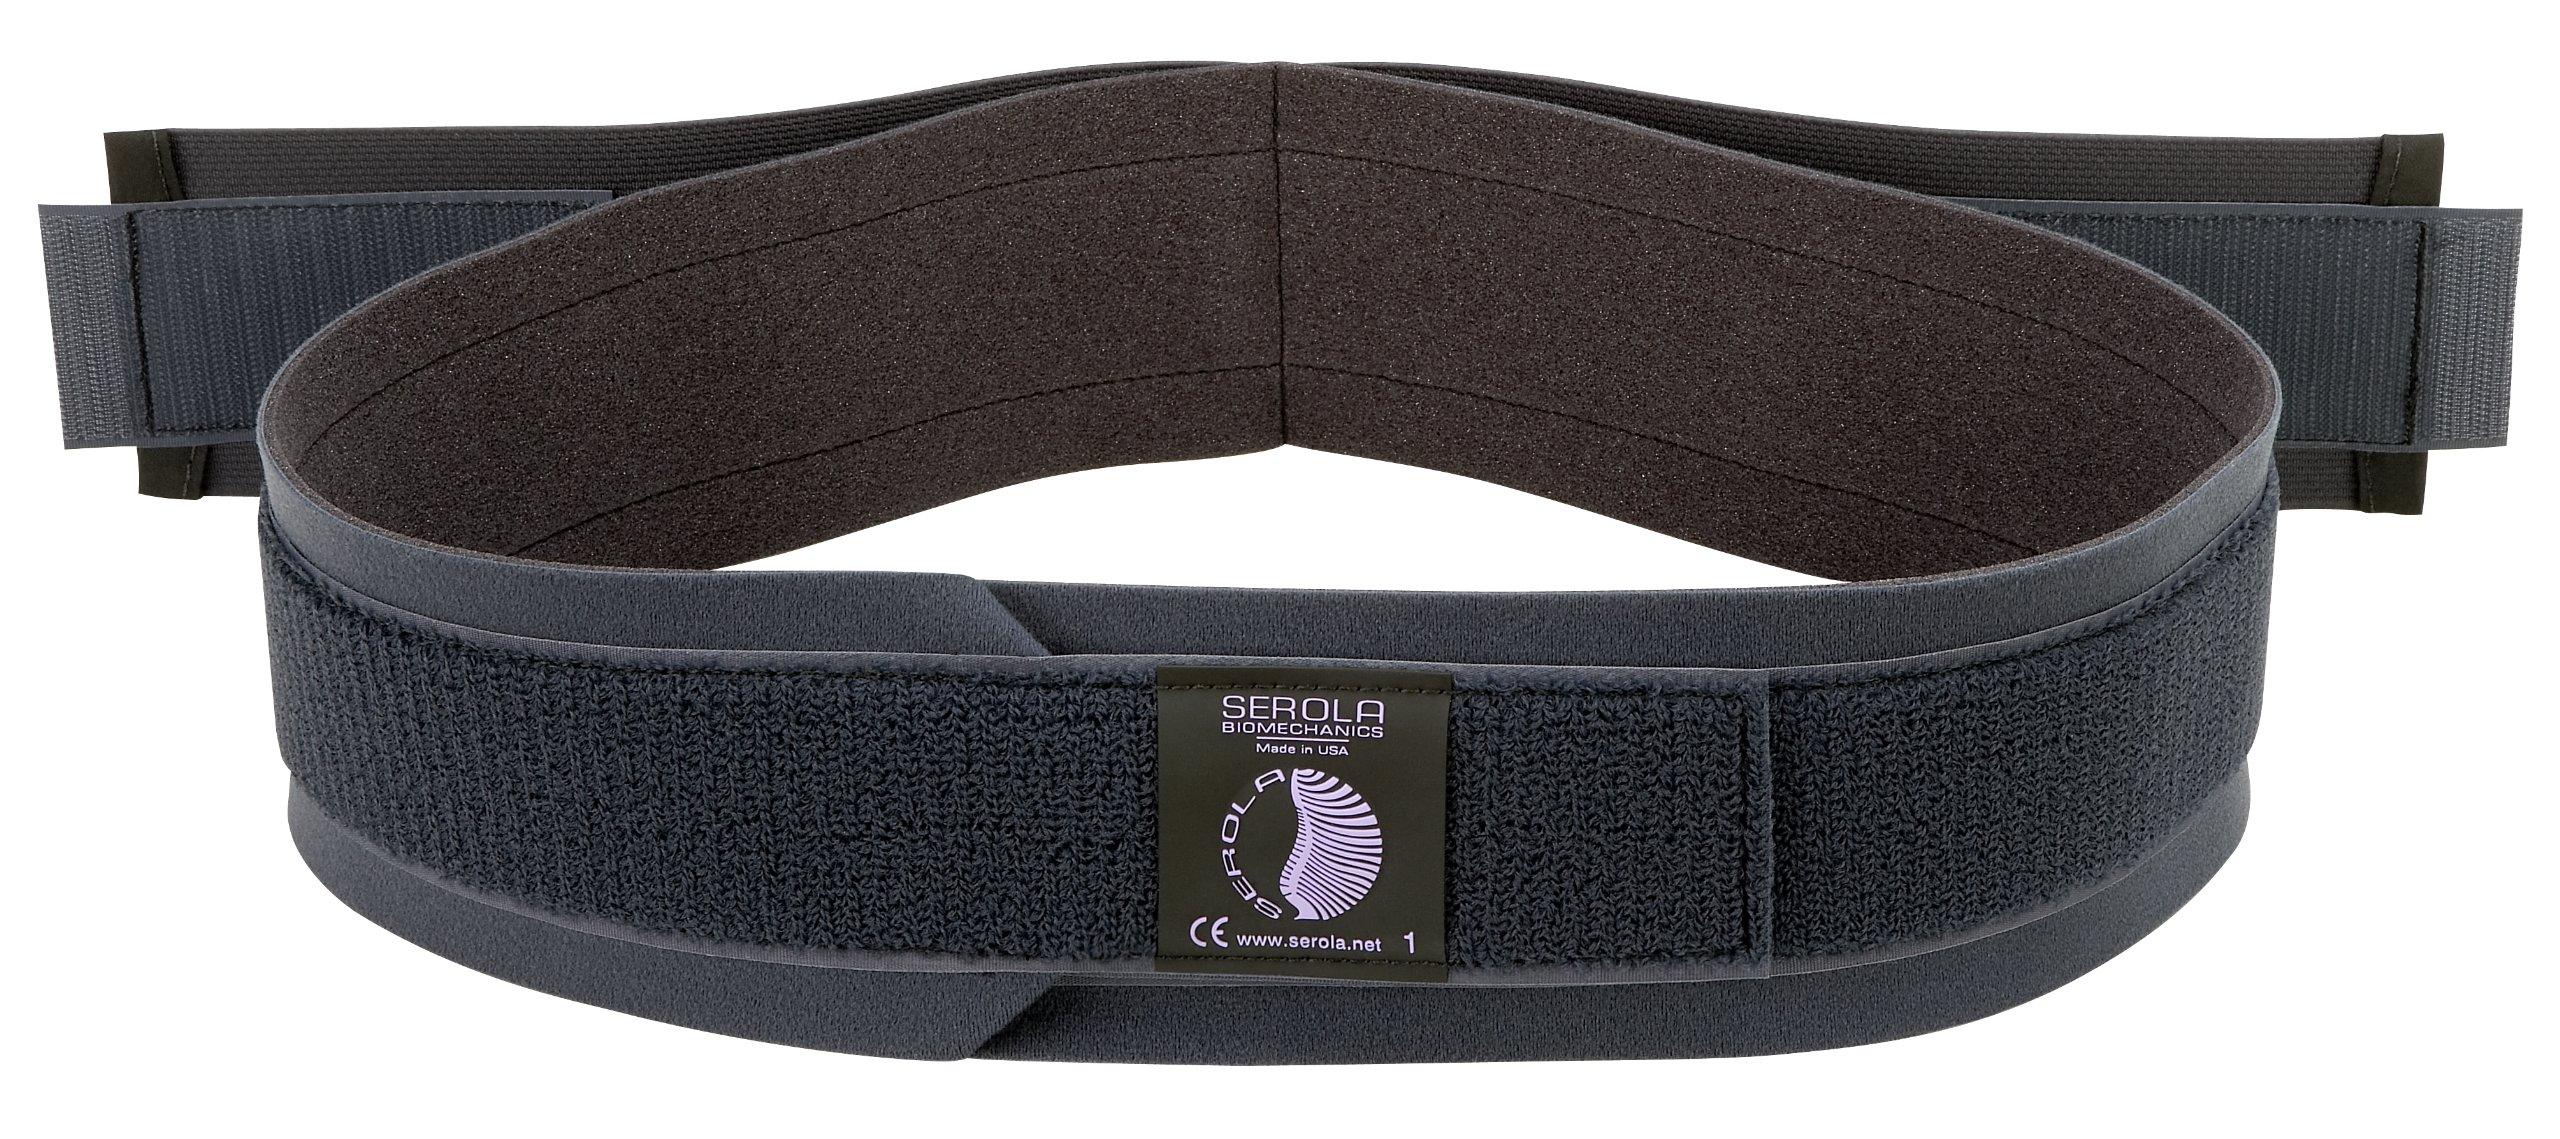 Serola® Sacroiliac Belt, X-Large - Fits 46'' to 52'' Hip Measurement by SEROLA